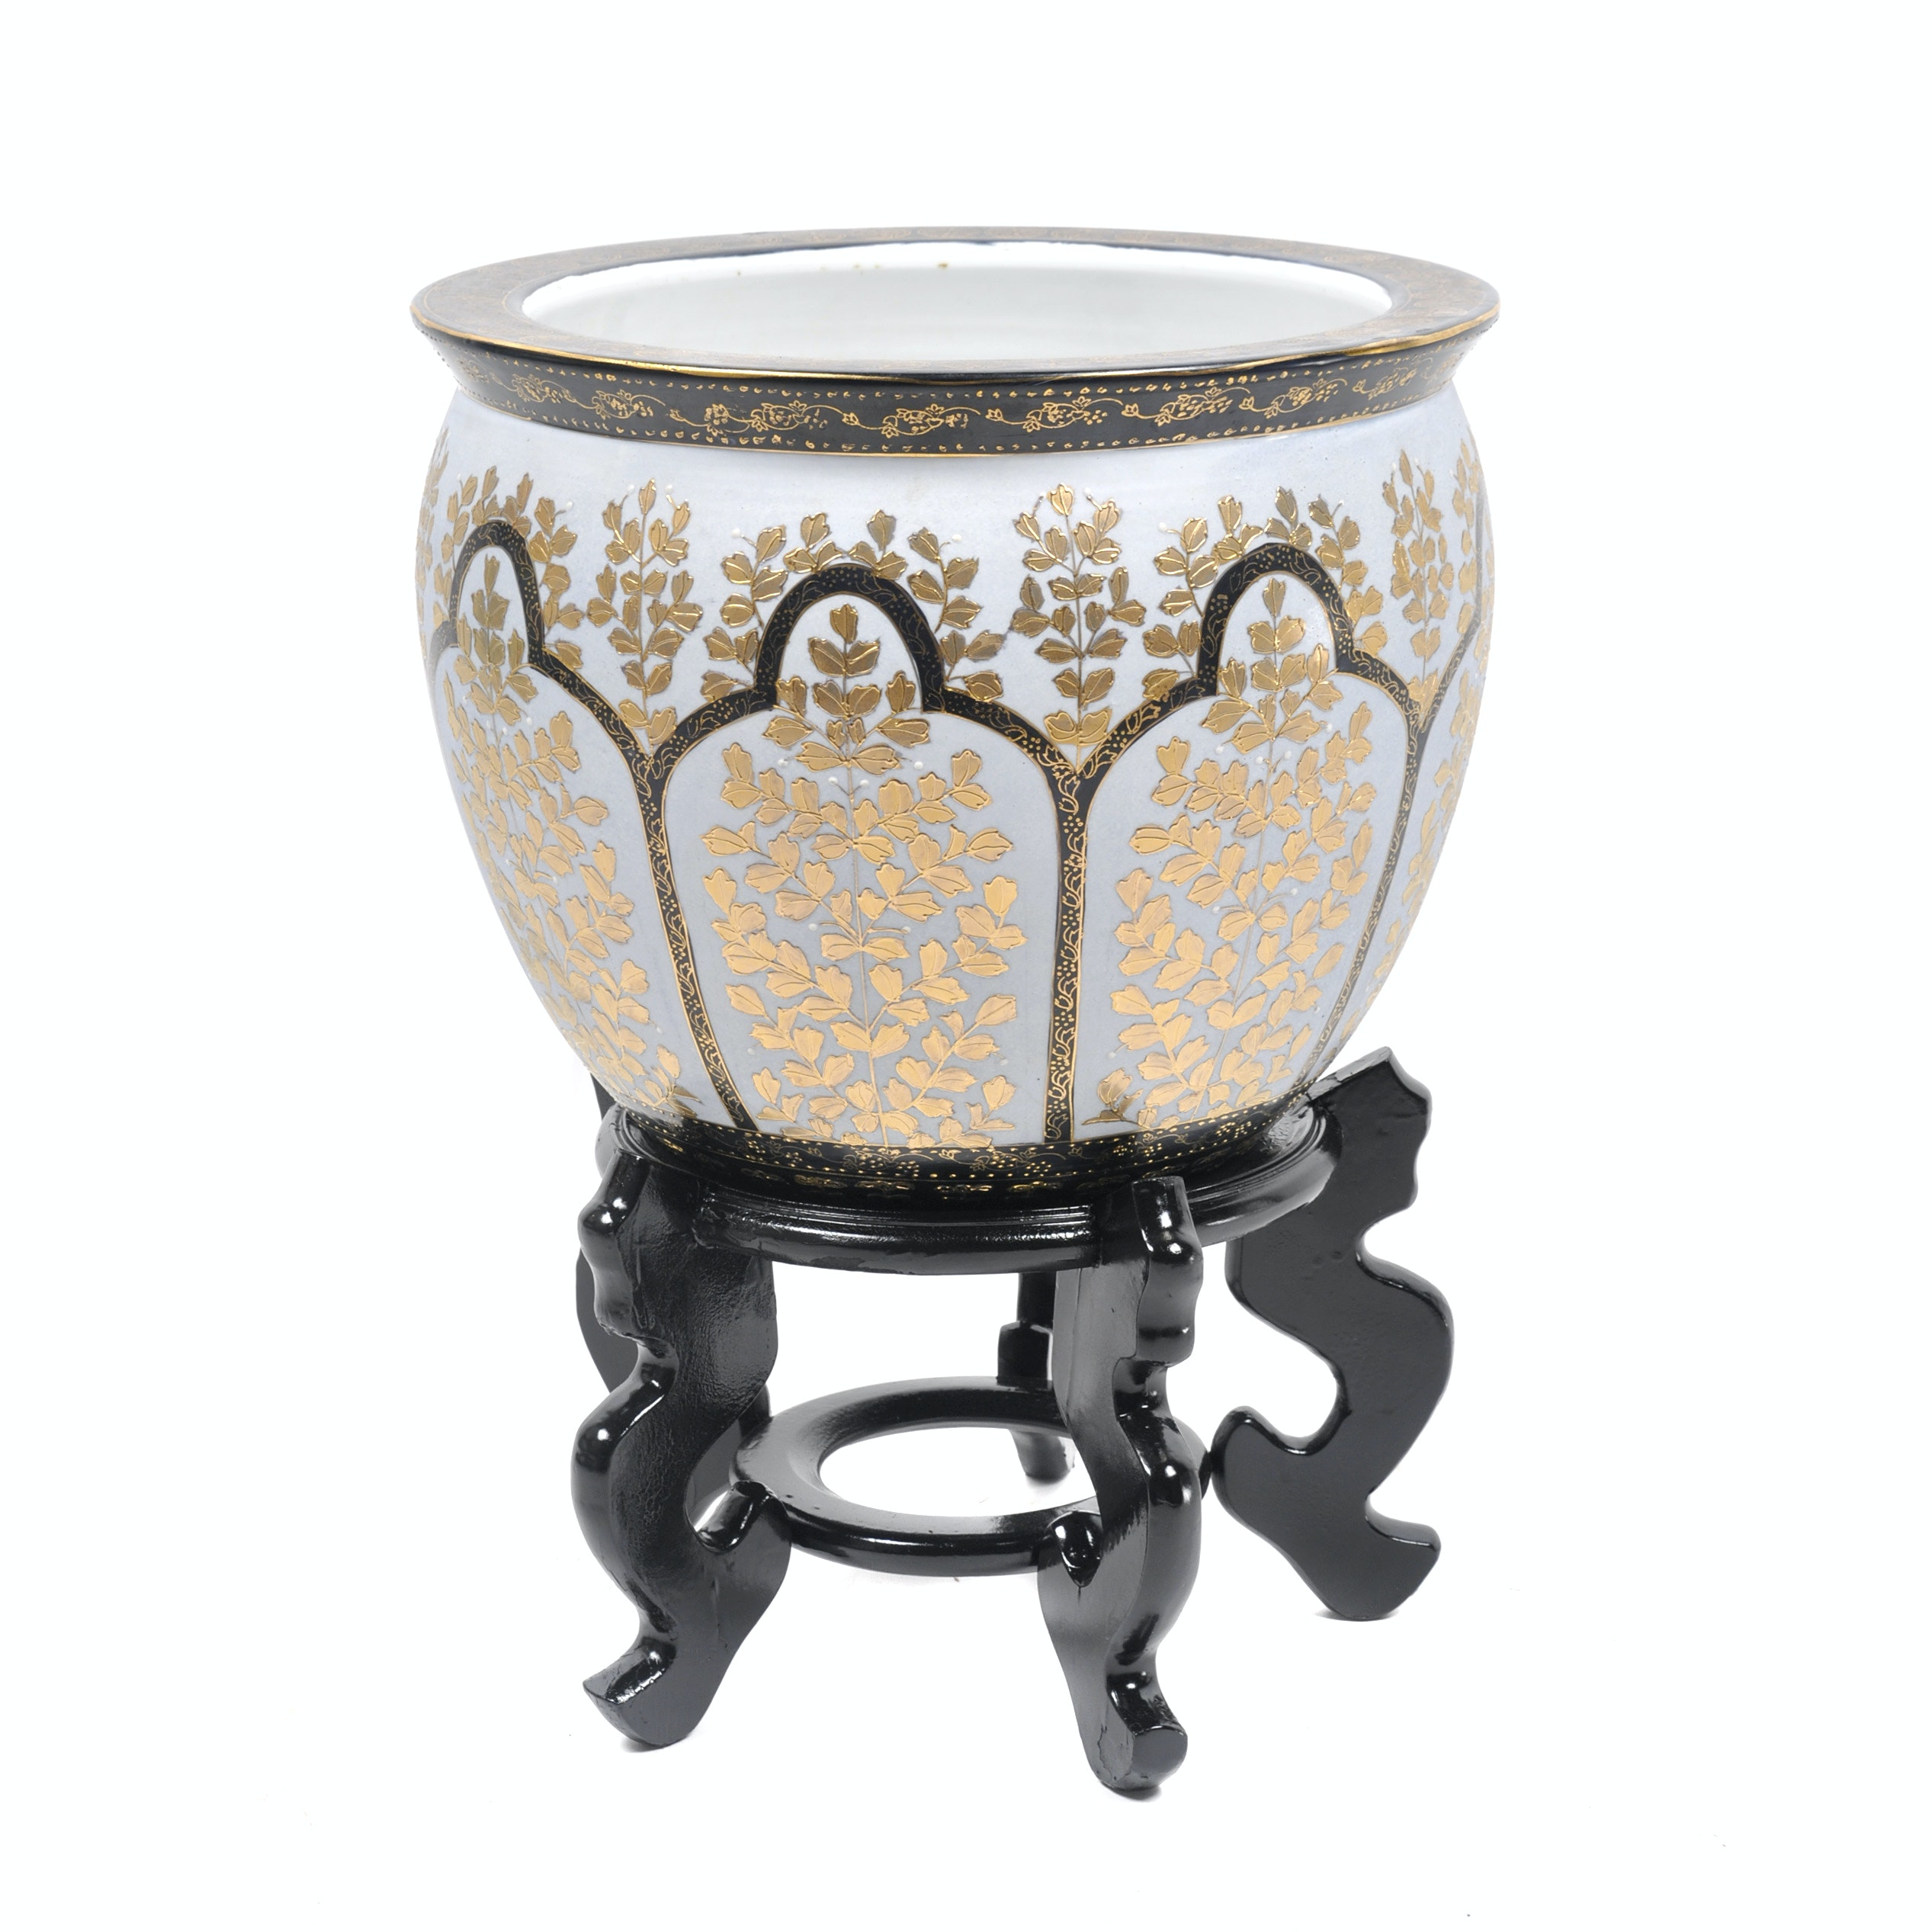 Chinese Porcelain Goldfish Planter and Pedestal